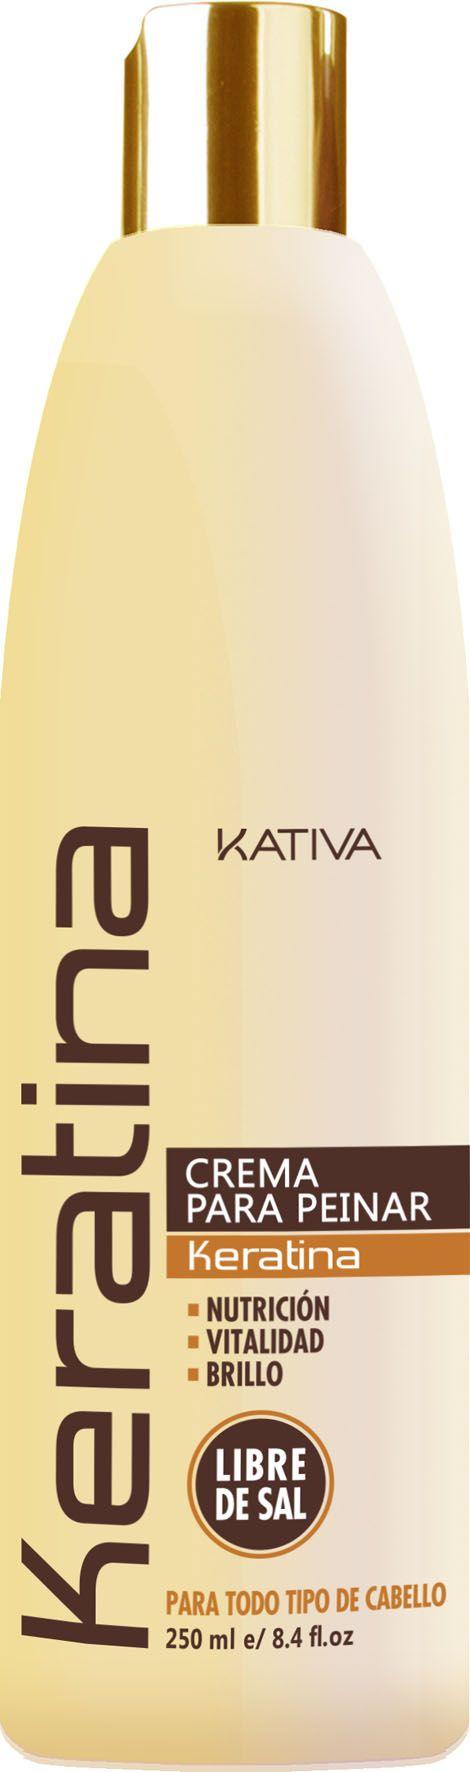 Kativa Keratina Crema para Peinar STYLING Xωρίς άλατα Είναι μια styling cream που κάνει ταυτόχρονα θεραπεία με βάση την κερατίνη (χωρίς άλας). Διευκολύνει το χτένισμα και διατηρεί τέλειο styling όλη μέρα. Βοηθά την αναδιάρθρωση και την ενίσχυση των ταλαιπωρημένων μαλλιών , αφήνοντάς τα λαμπερά και ευκολοχτένιστα. Ελαχιστοποιεί και ελέγχει το φριζάρισμα.